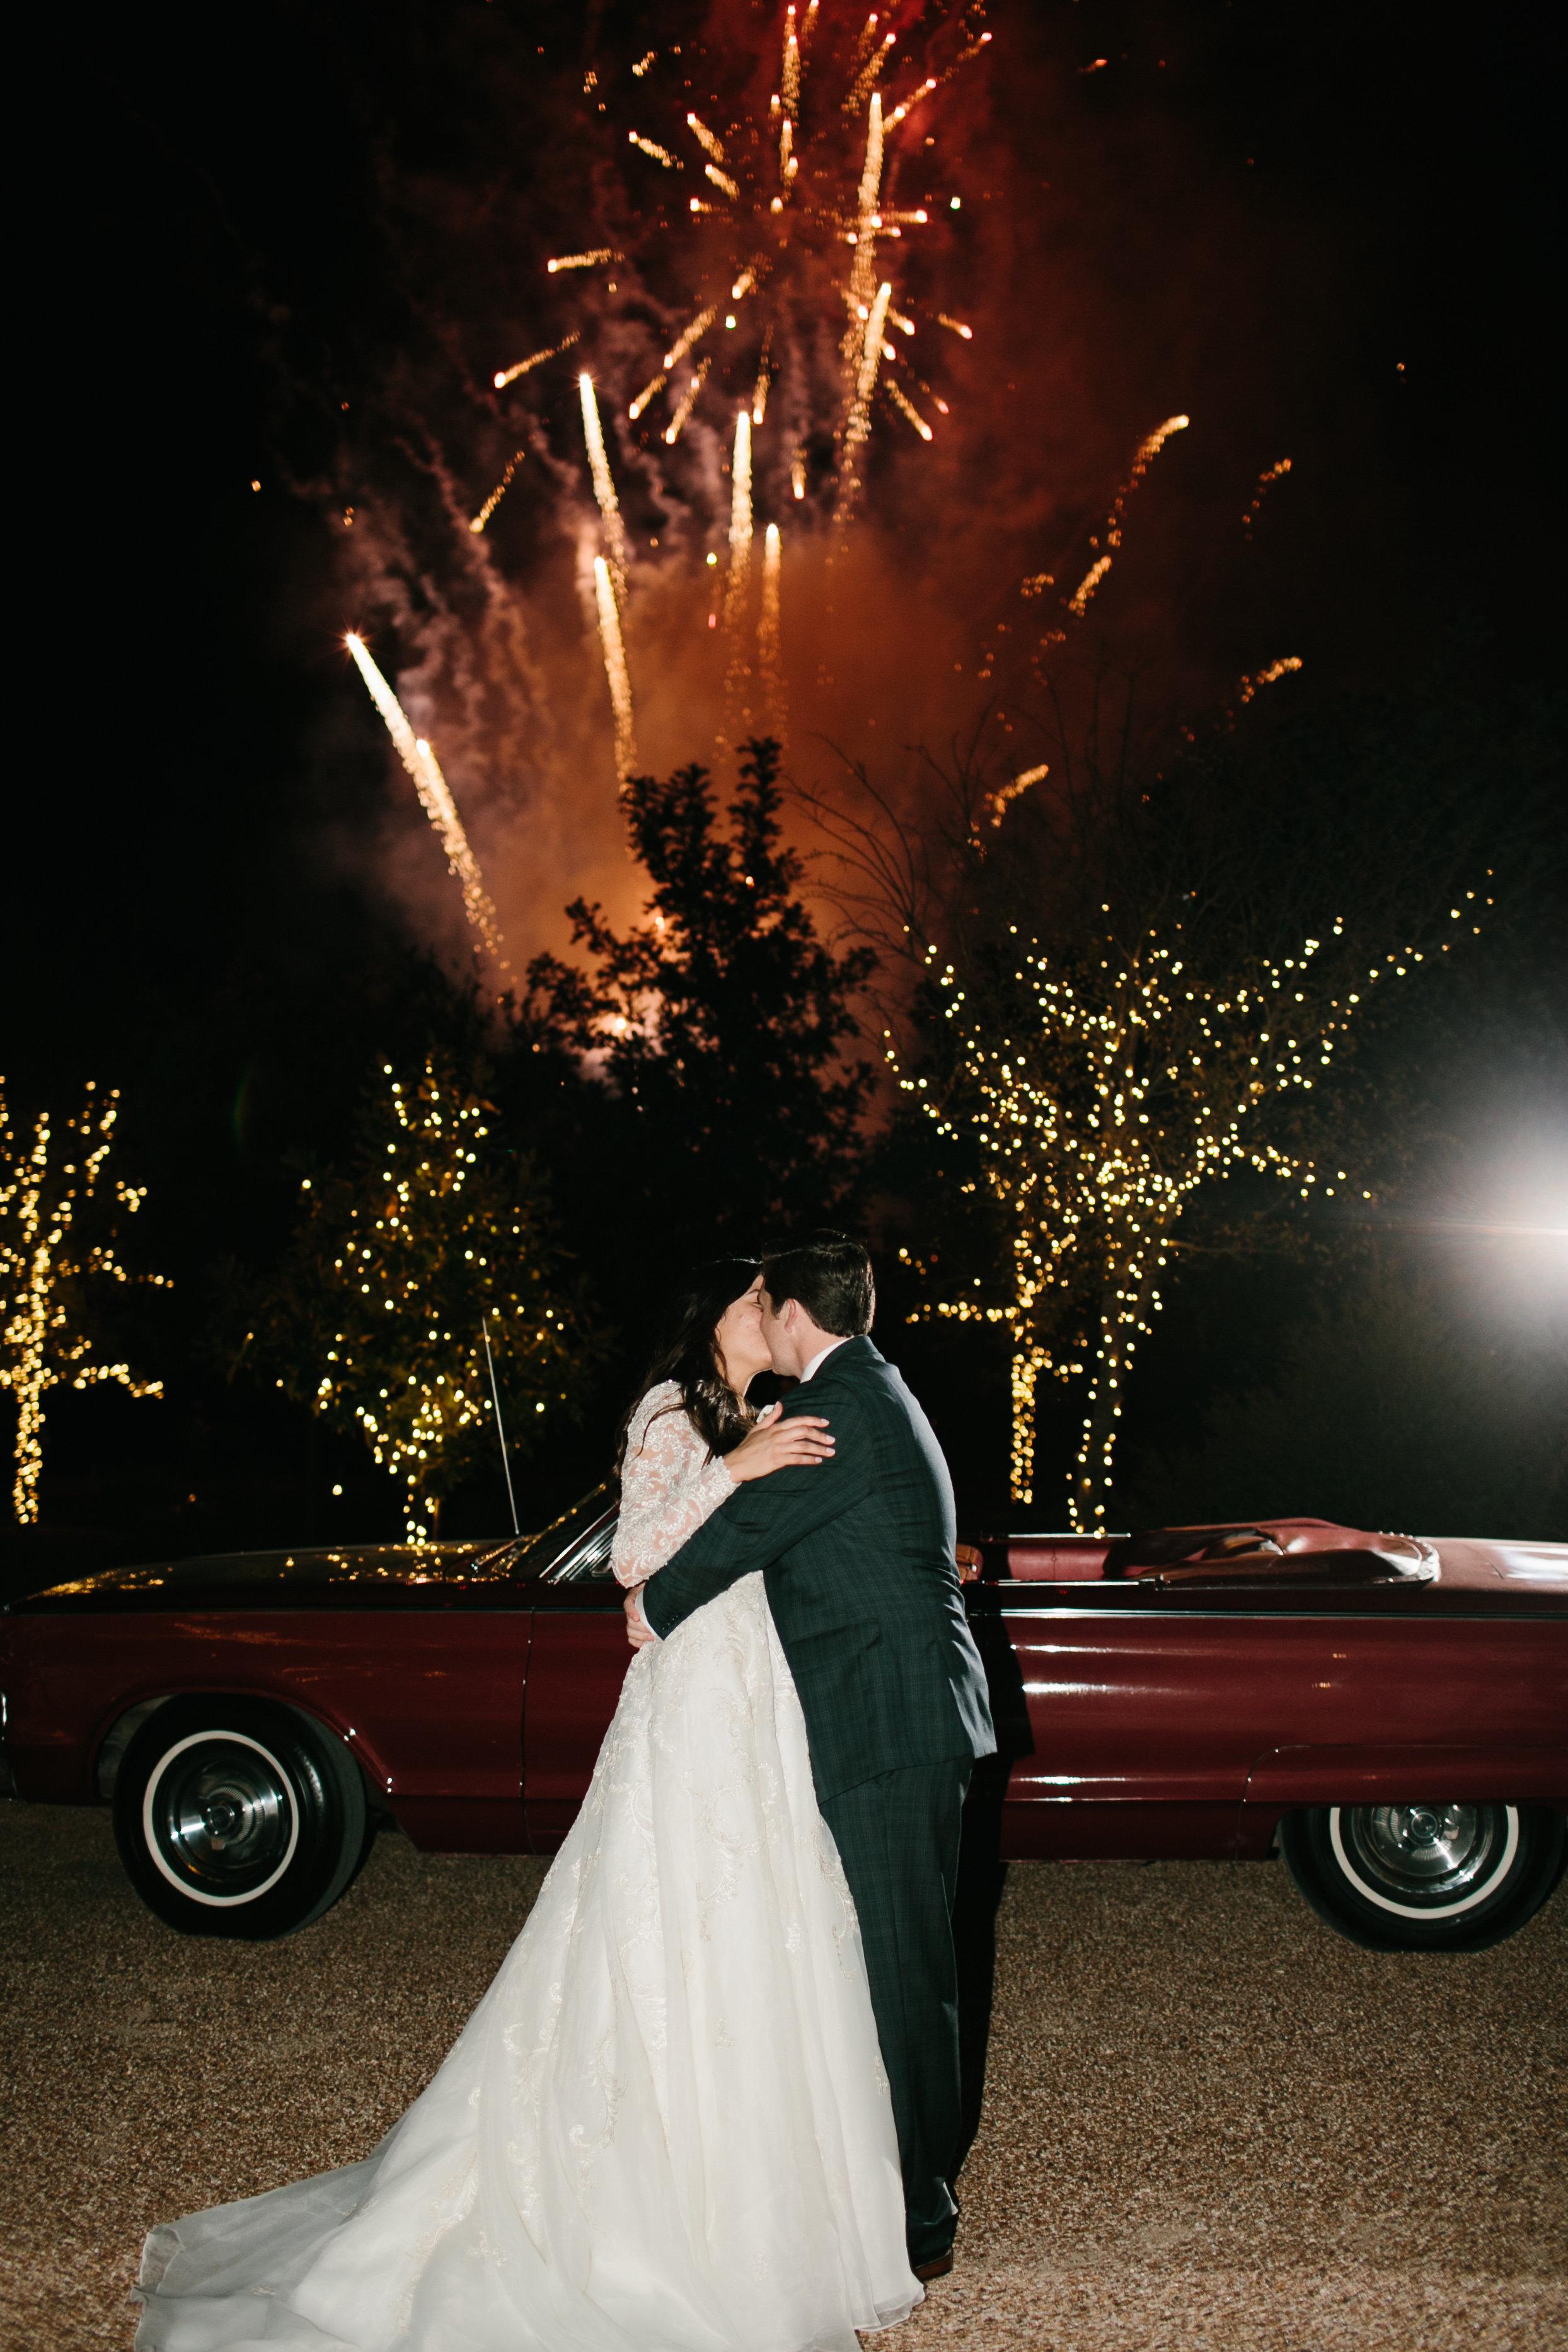 shannon_rose_rent_my_dust_fall_wedding_ (20).jpg